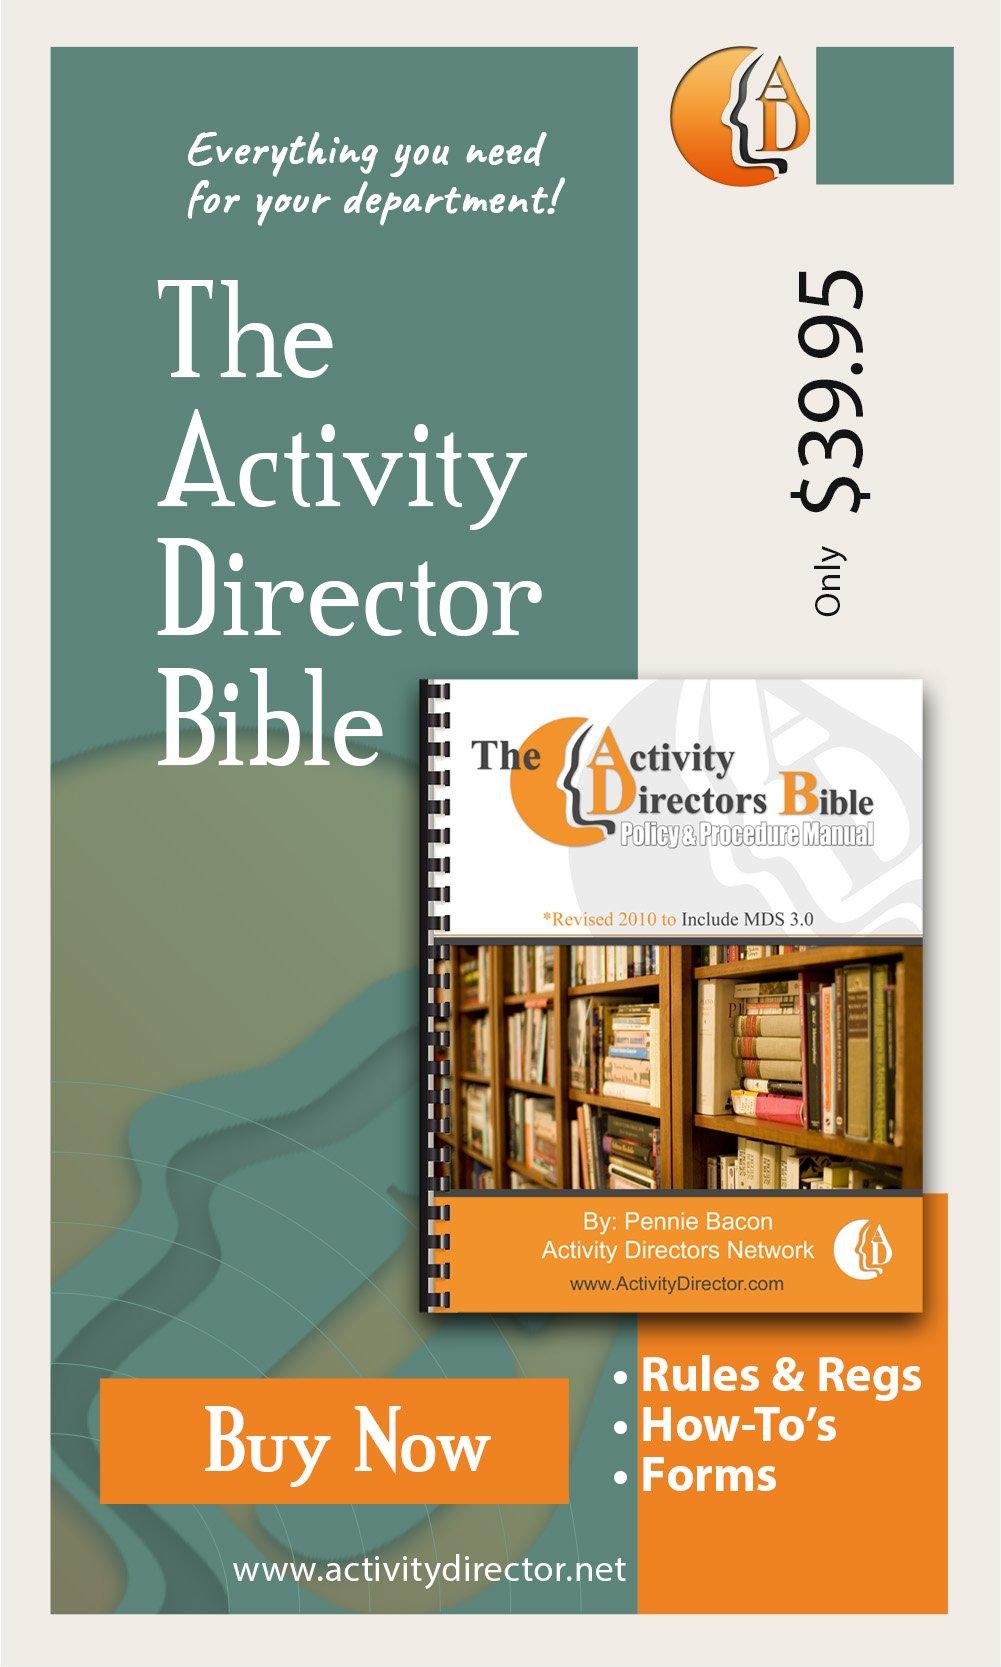 Activity Directors Bible OnSale